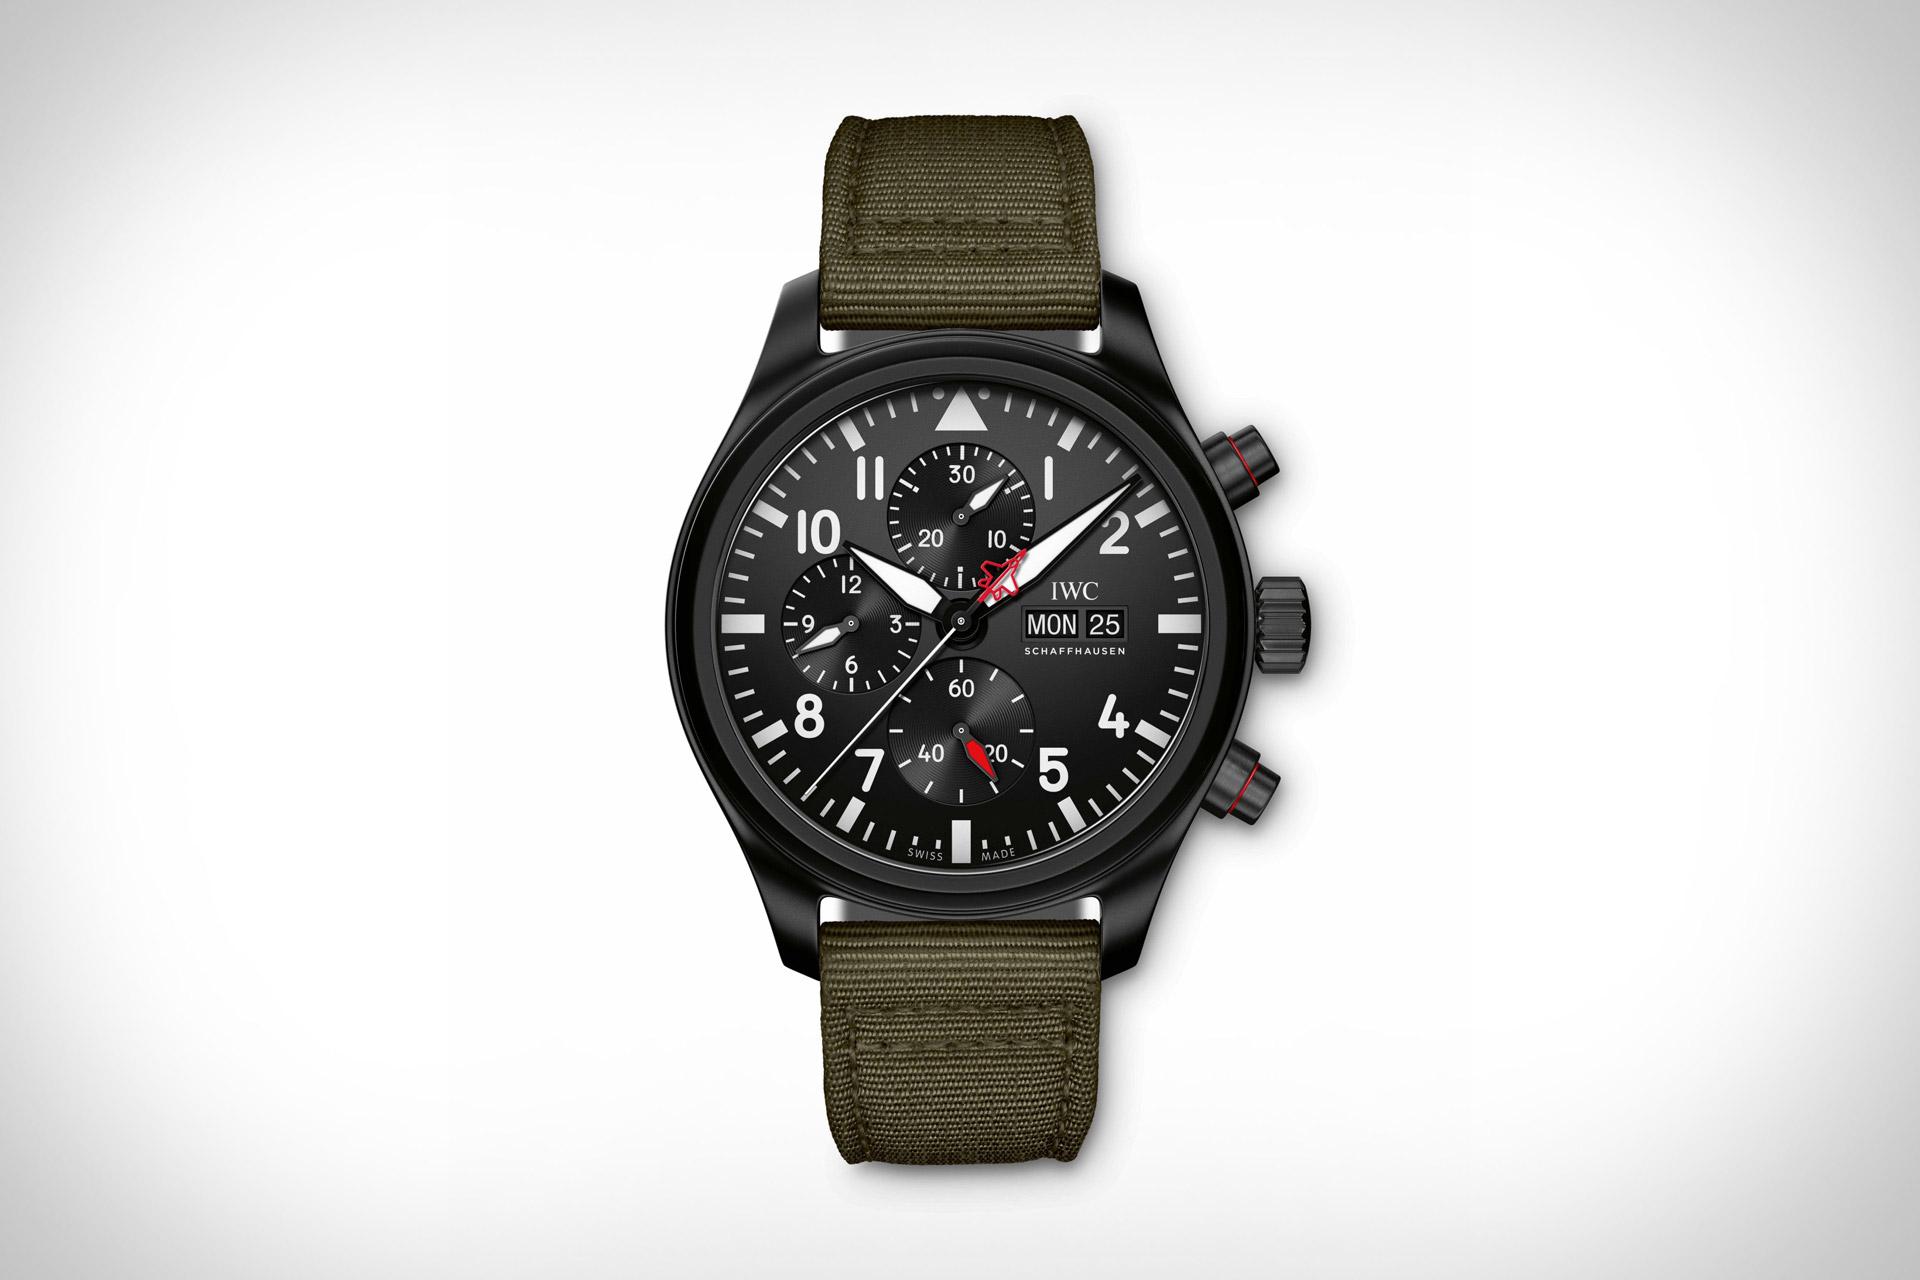 IWC Top Gun SFTI Pilot's Watch